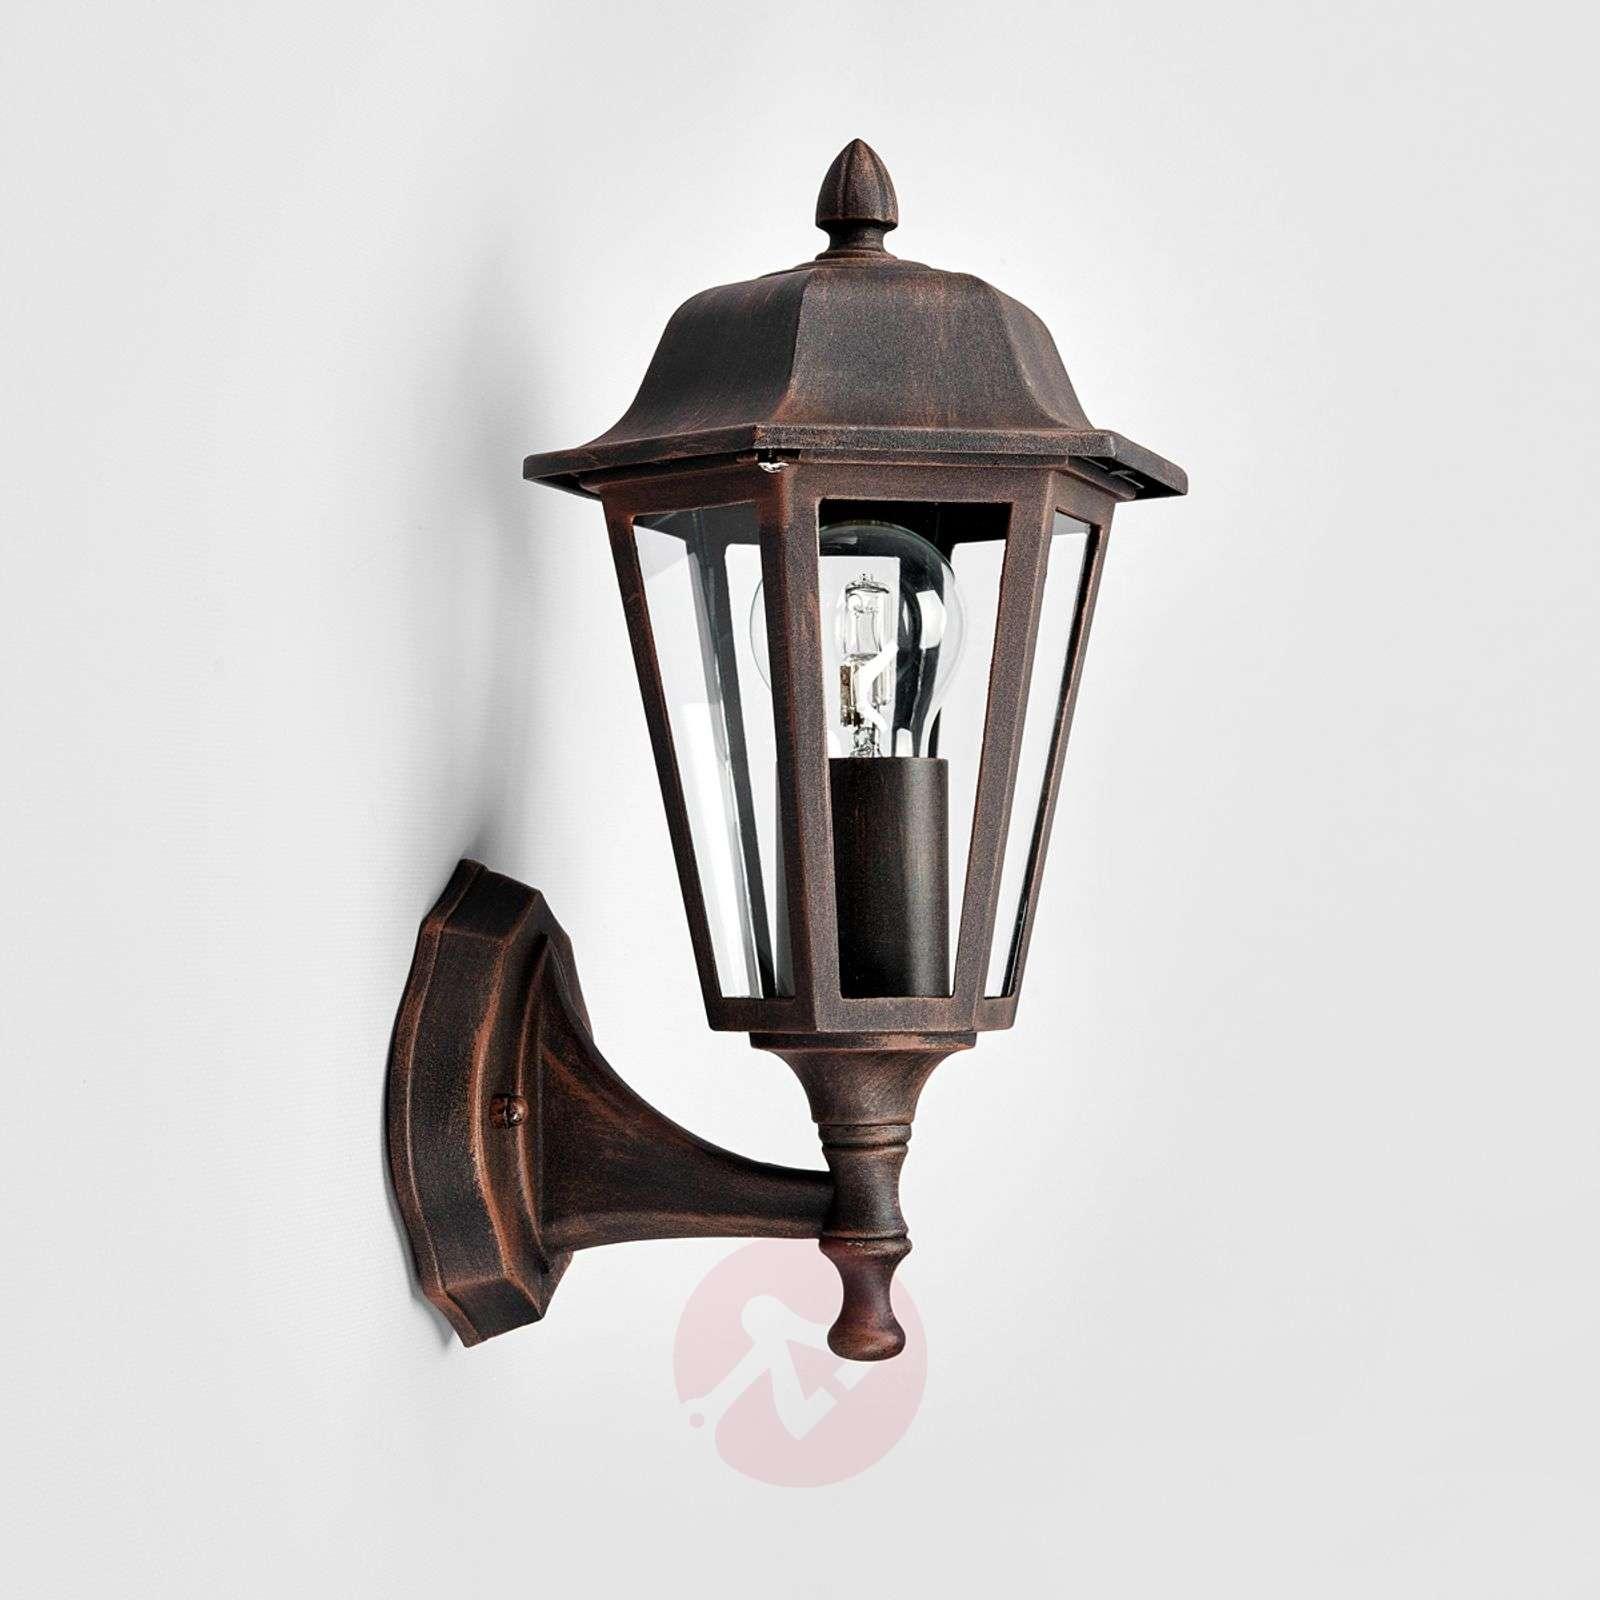 Beautiful outdoor wall light Lamina-9630054-01